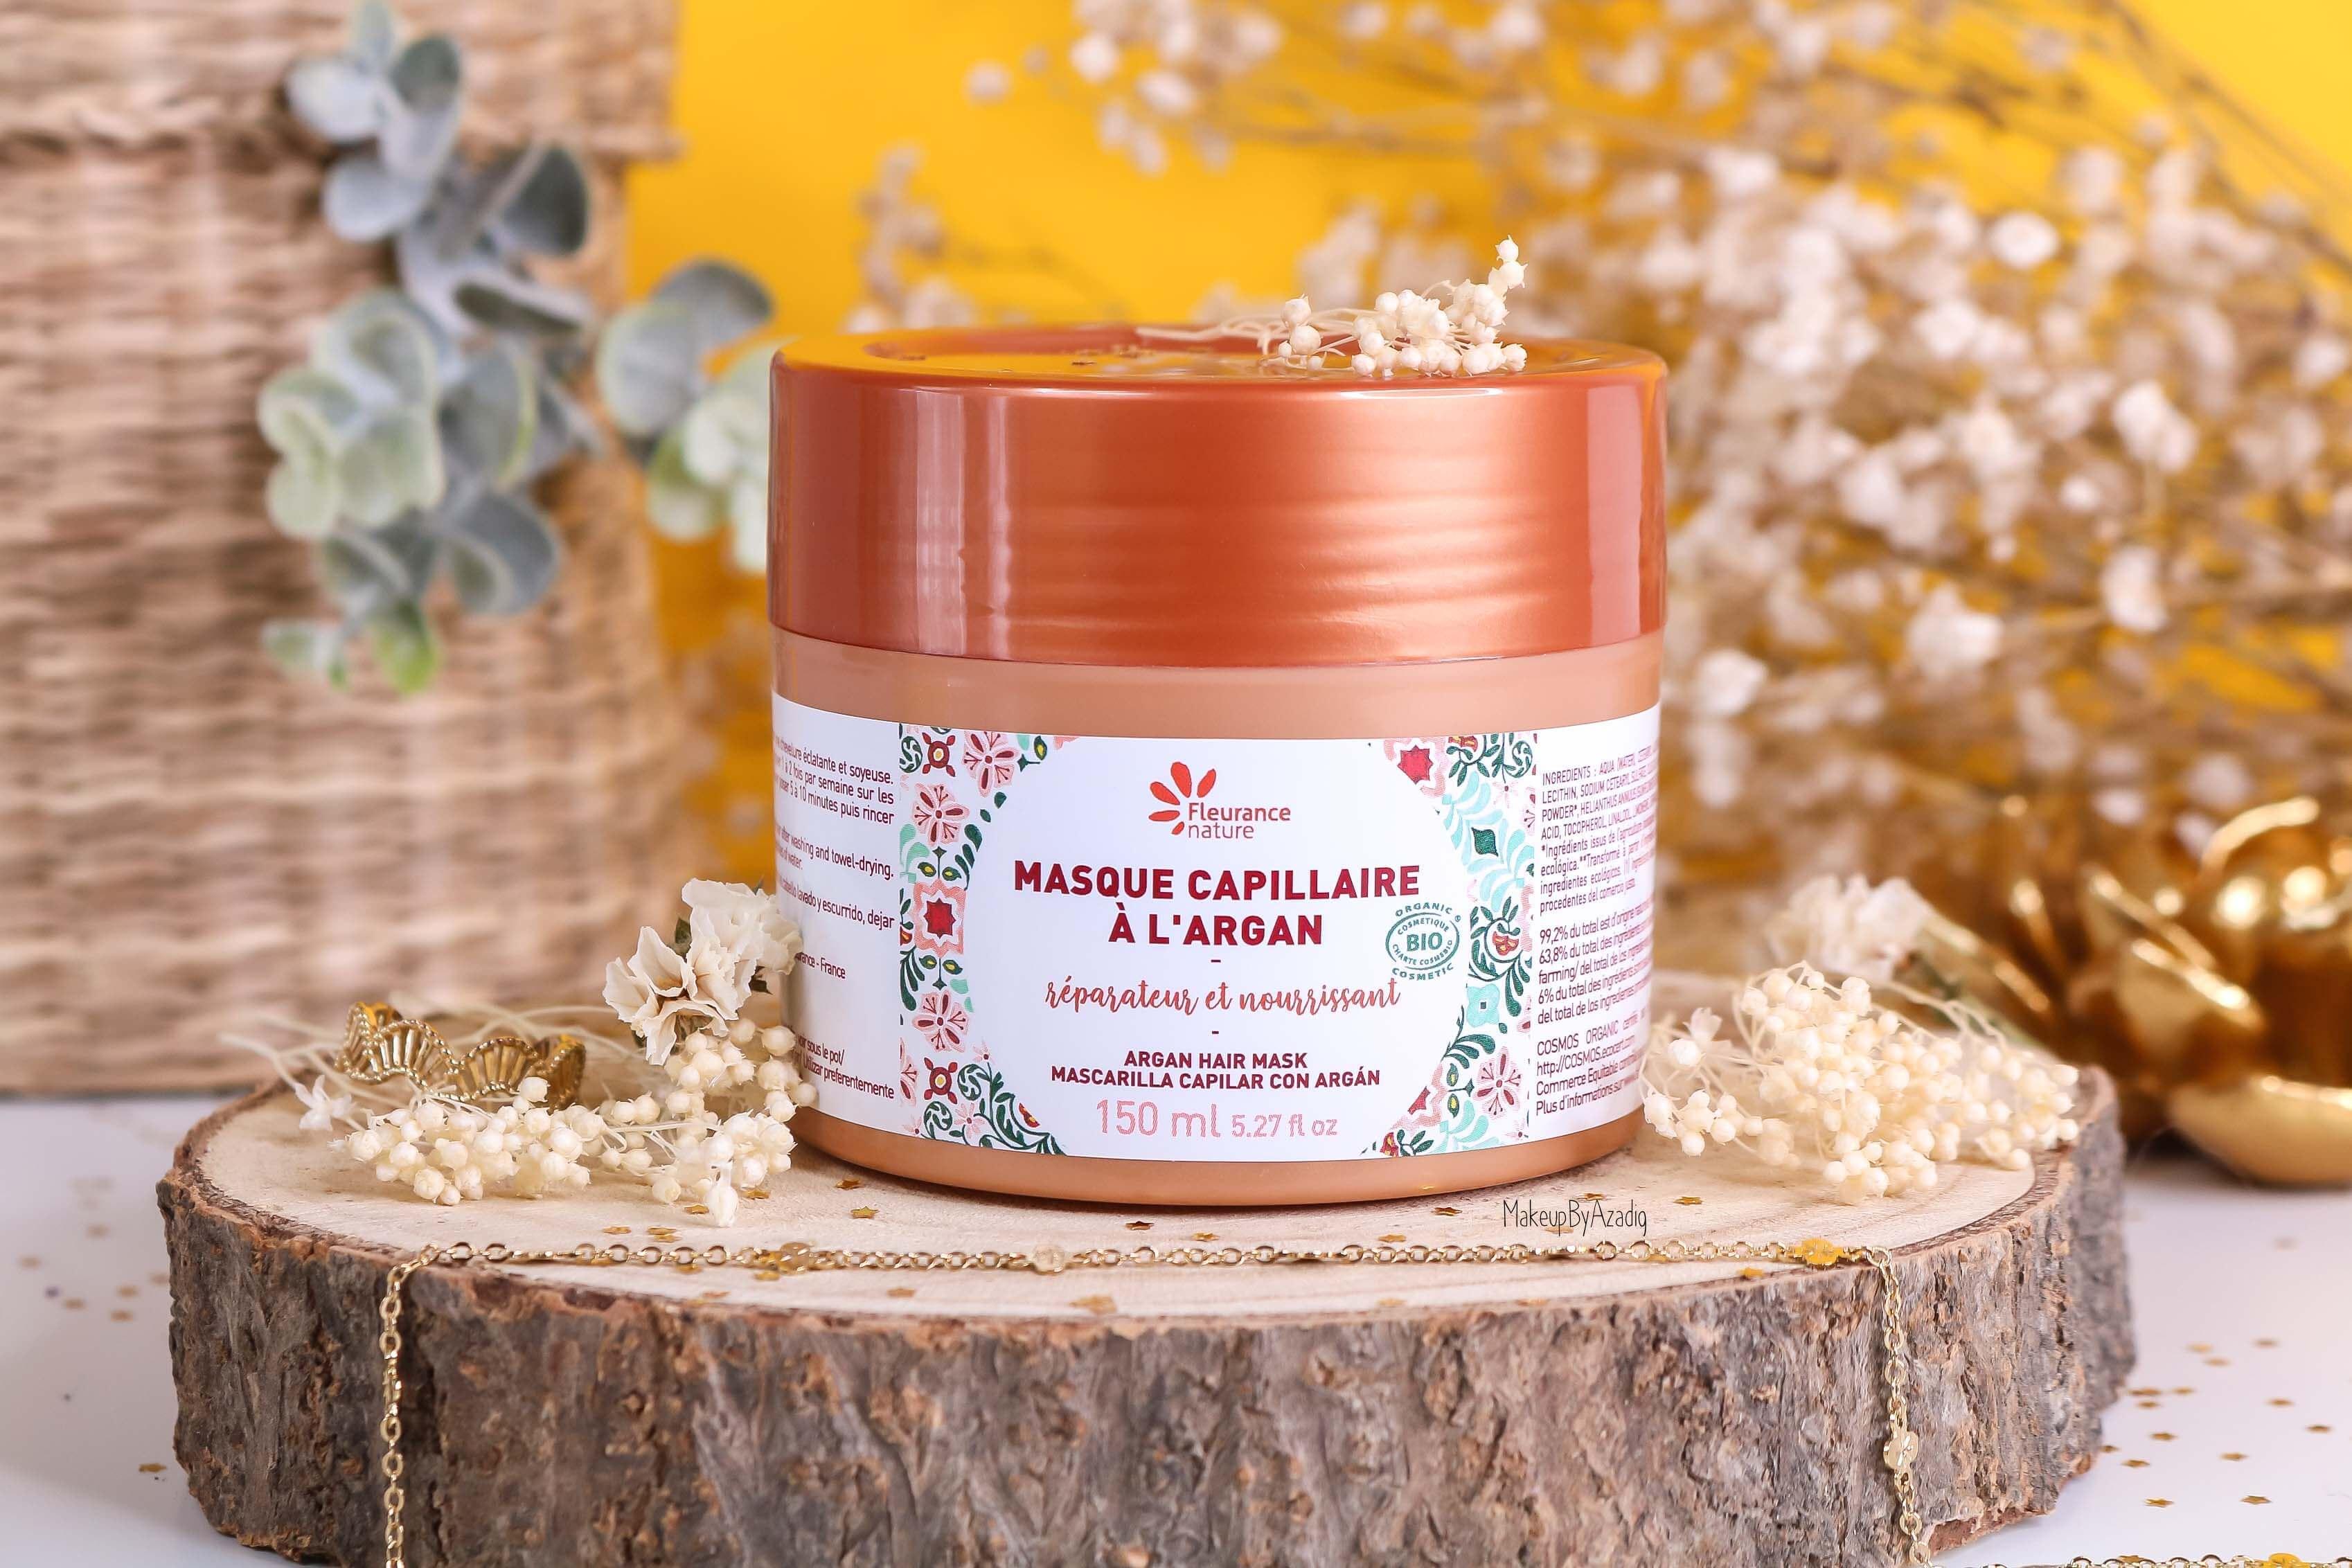 revue-masque-cheveux-capillaire-argan-reparateur-nourrissant-fleurance-nature-makeupbyazadig-bio-soin-avis-prix-resultat-packaging